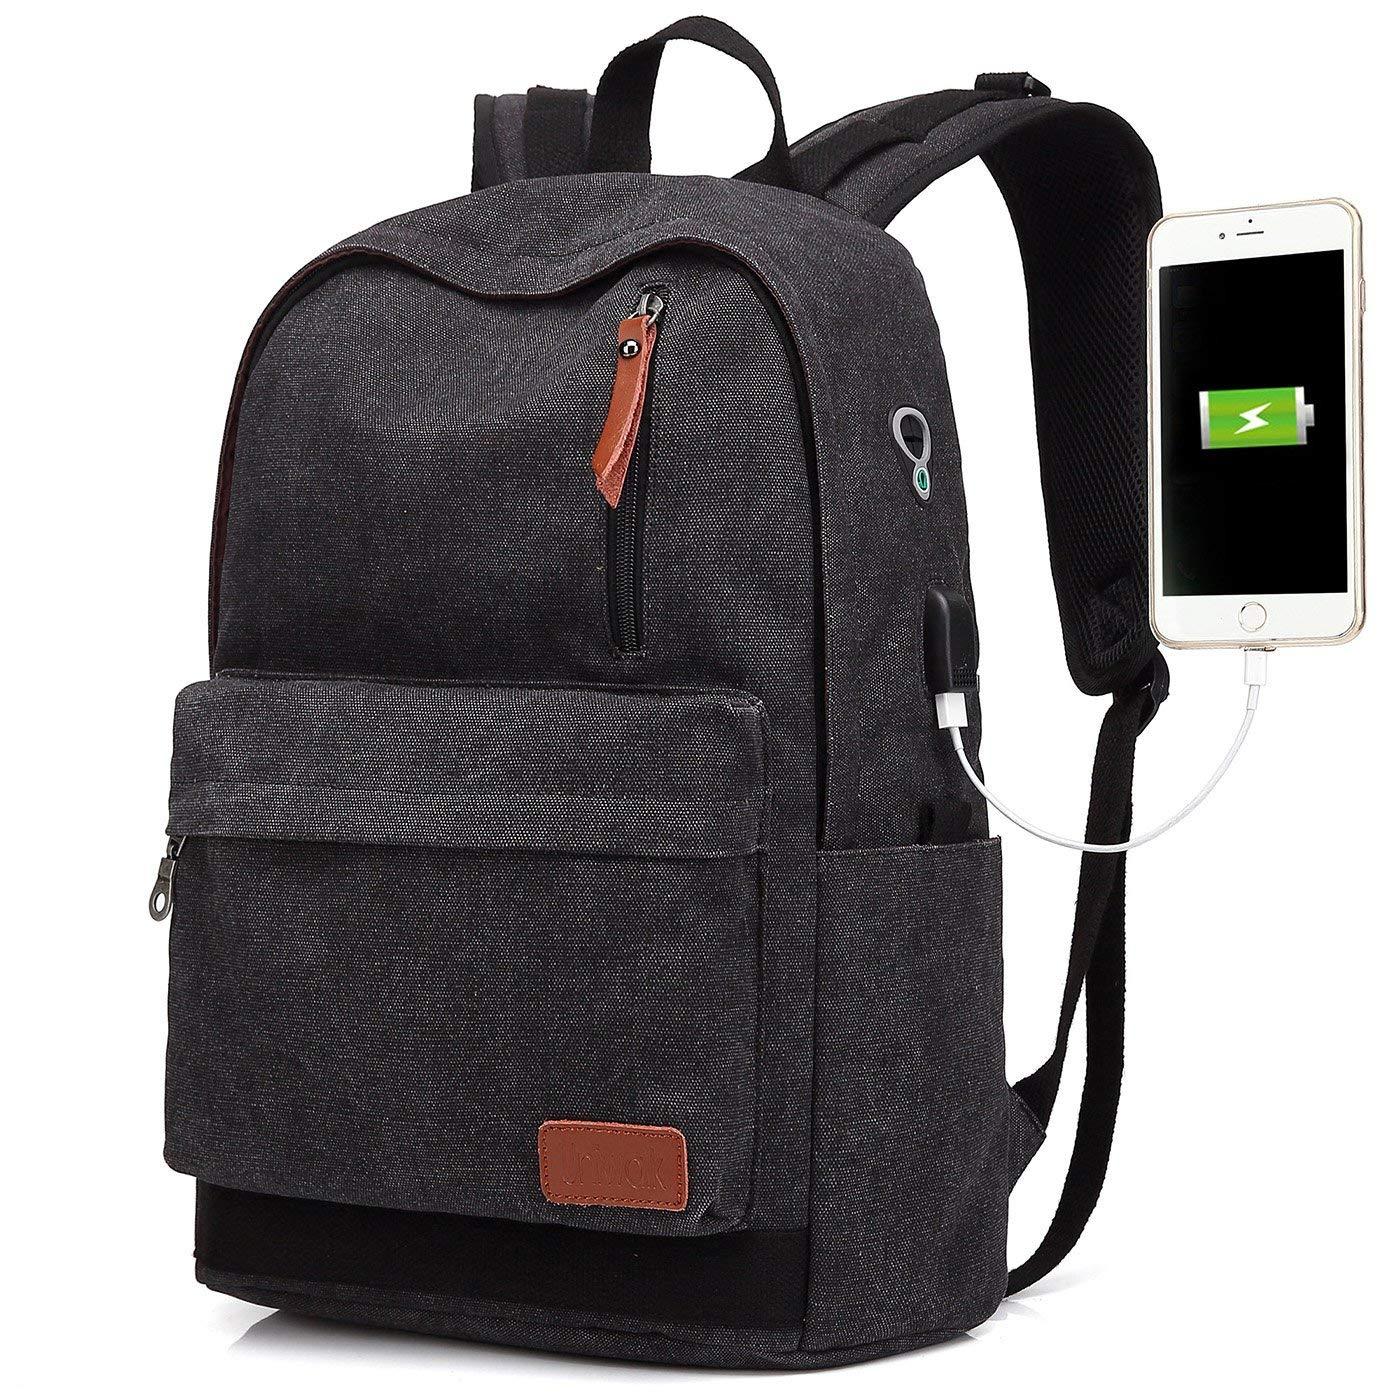 9510edbc1c79 Amazon.com  Canvas Laptop Backpack